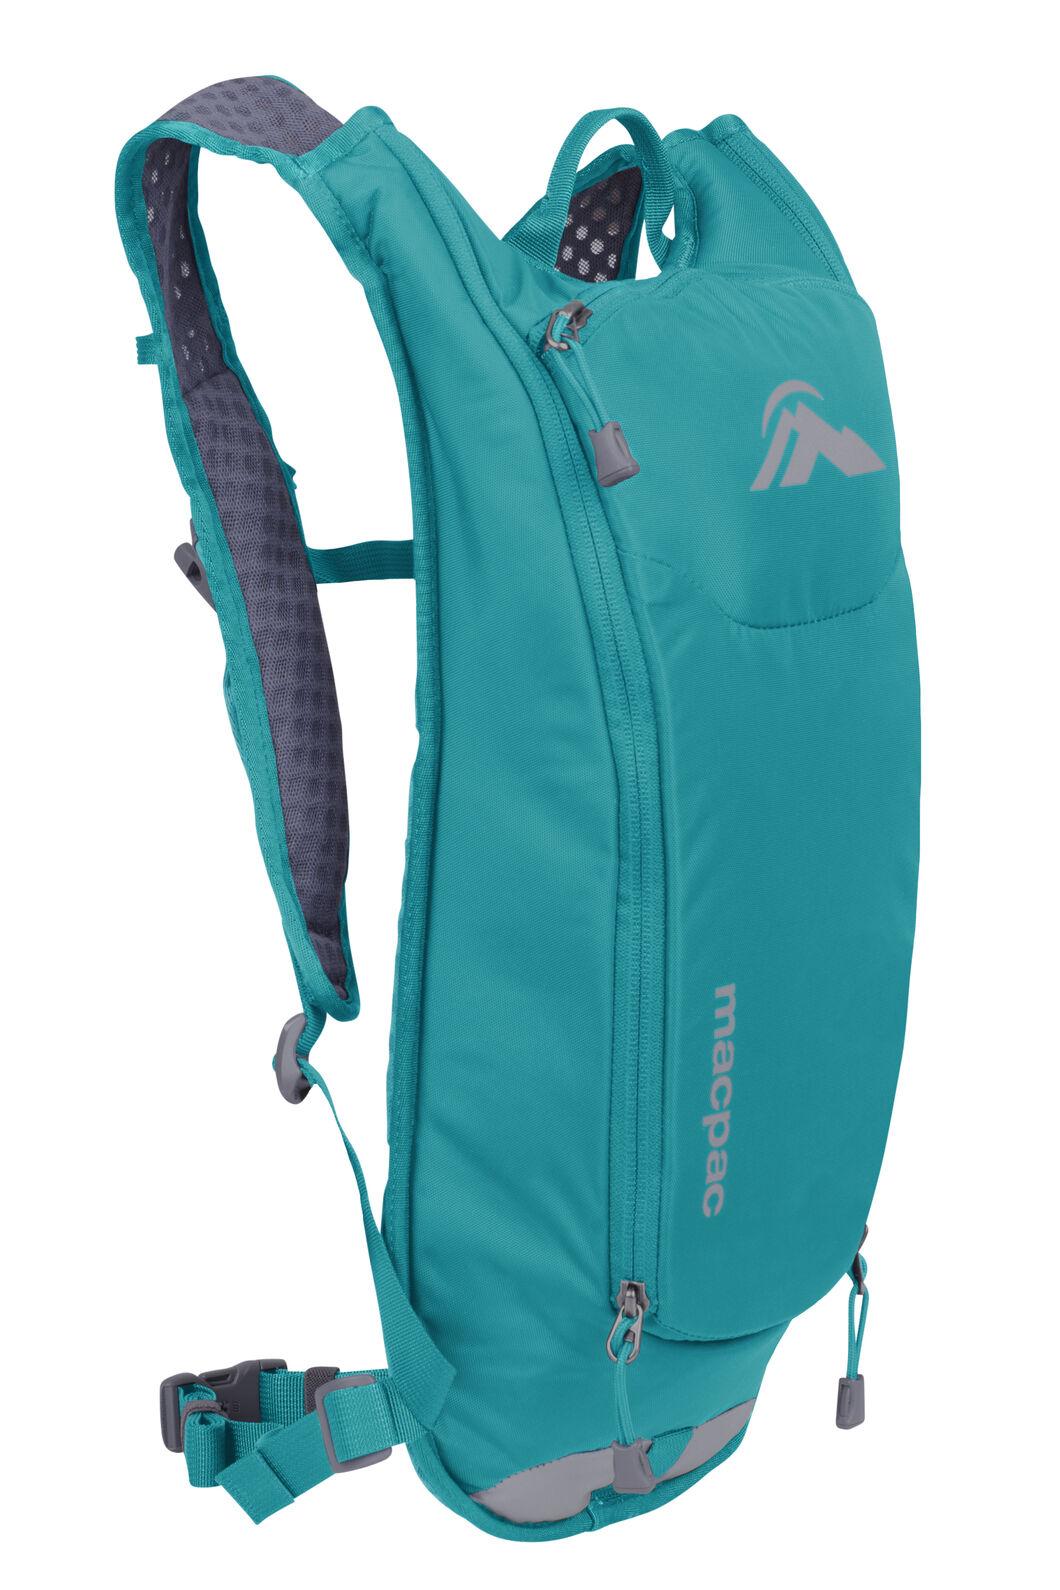 Macpac Amp H2O 2L Hydration Pack, Enamel Blue, hi-res